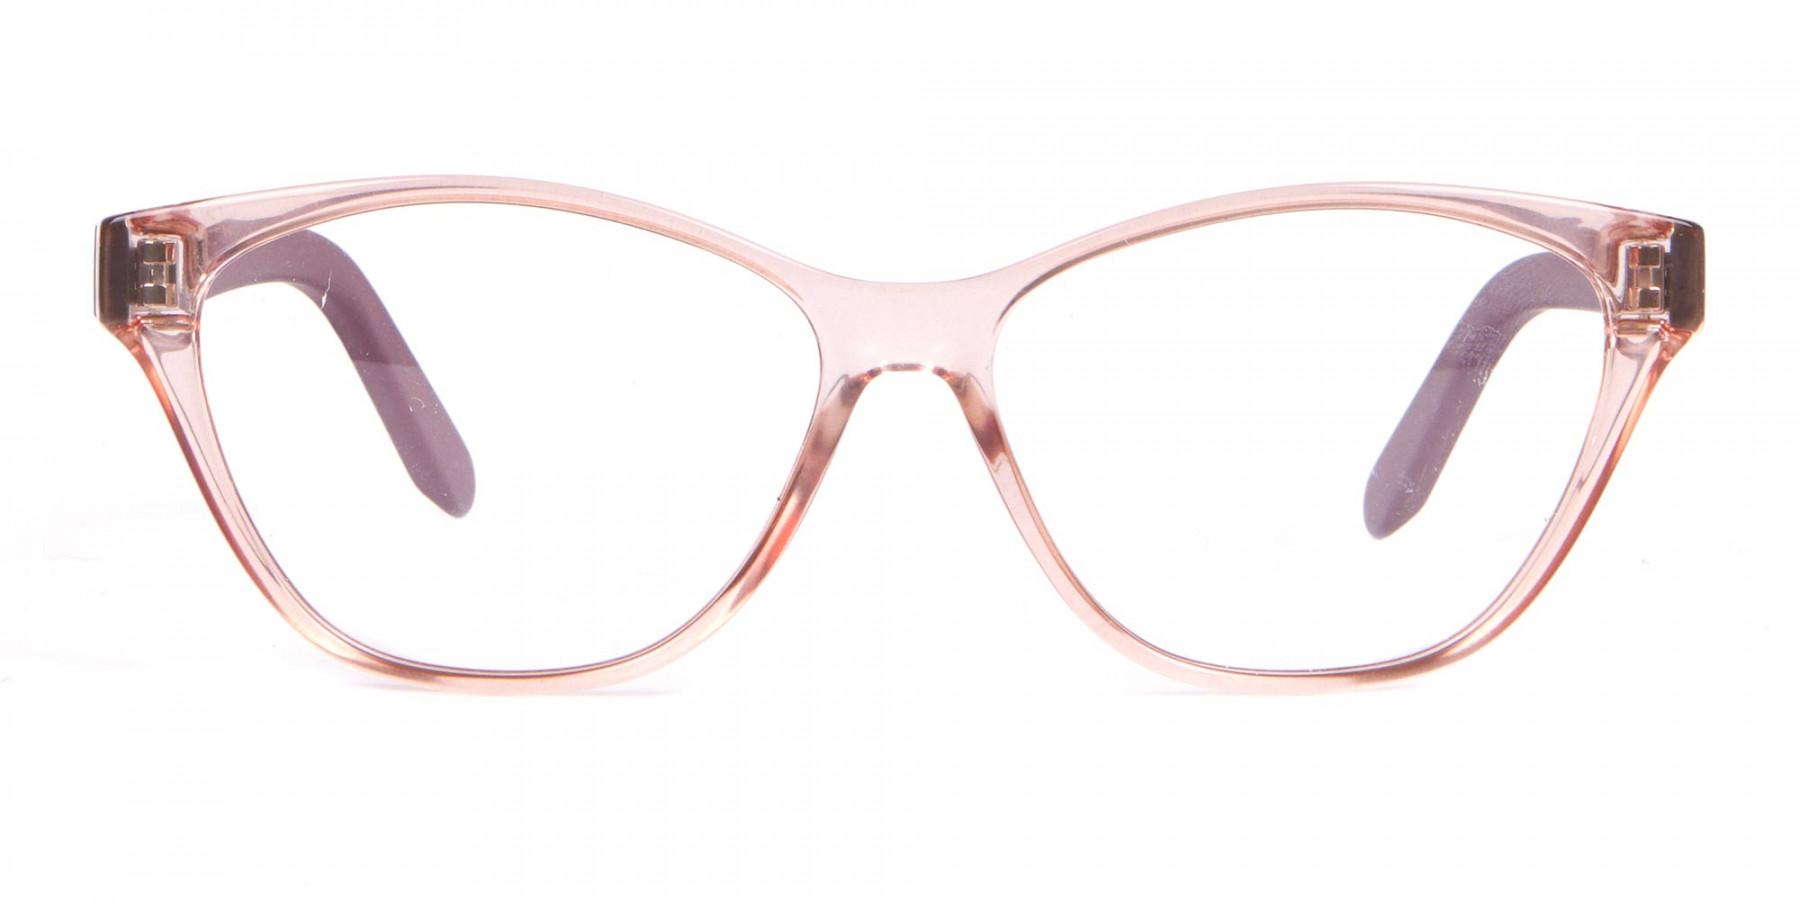 Salvatore Ferragamo SF2836 Women's Cat Eye Glasses Nude-1